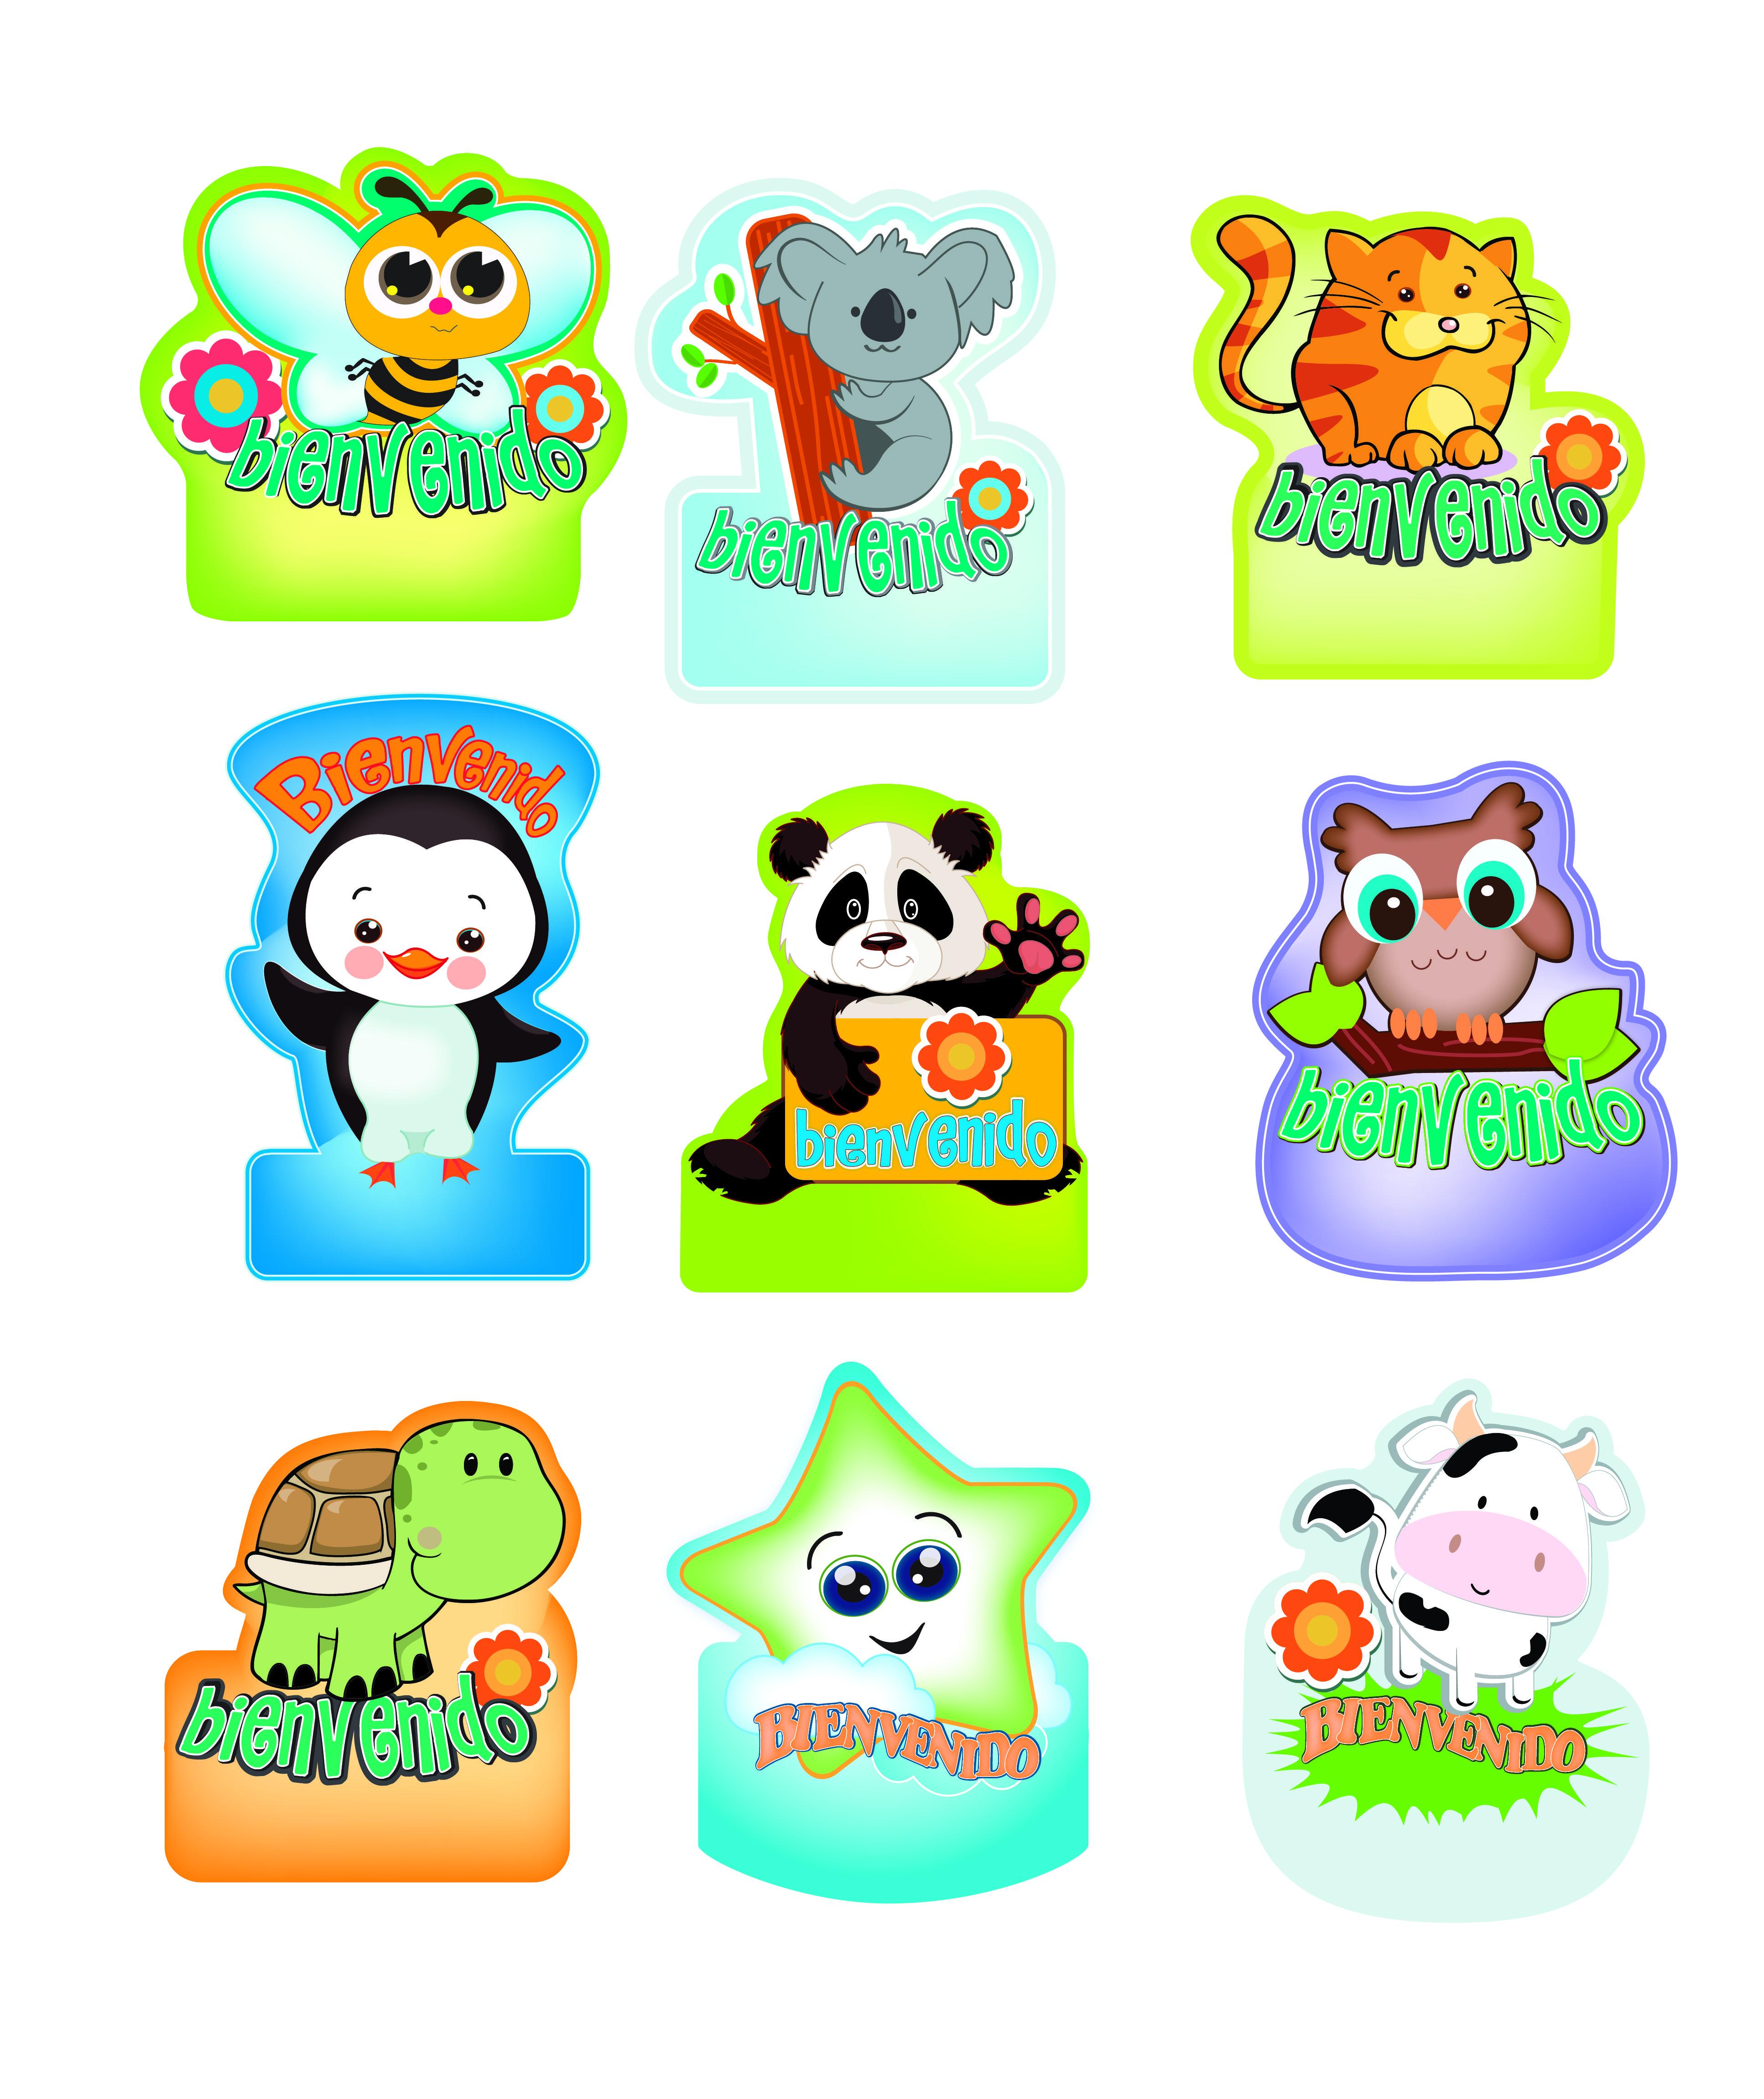 Gafetes de animalitos | Actividades | Pinterest | Búsqueda